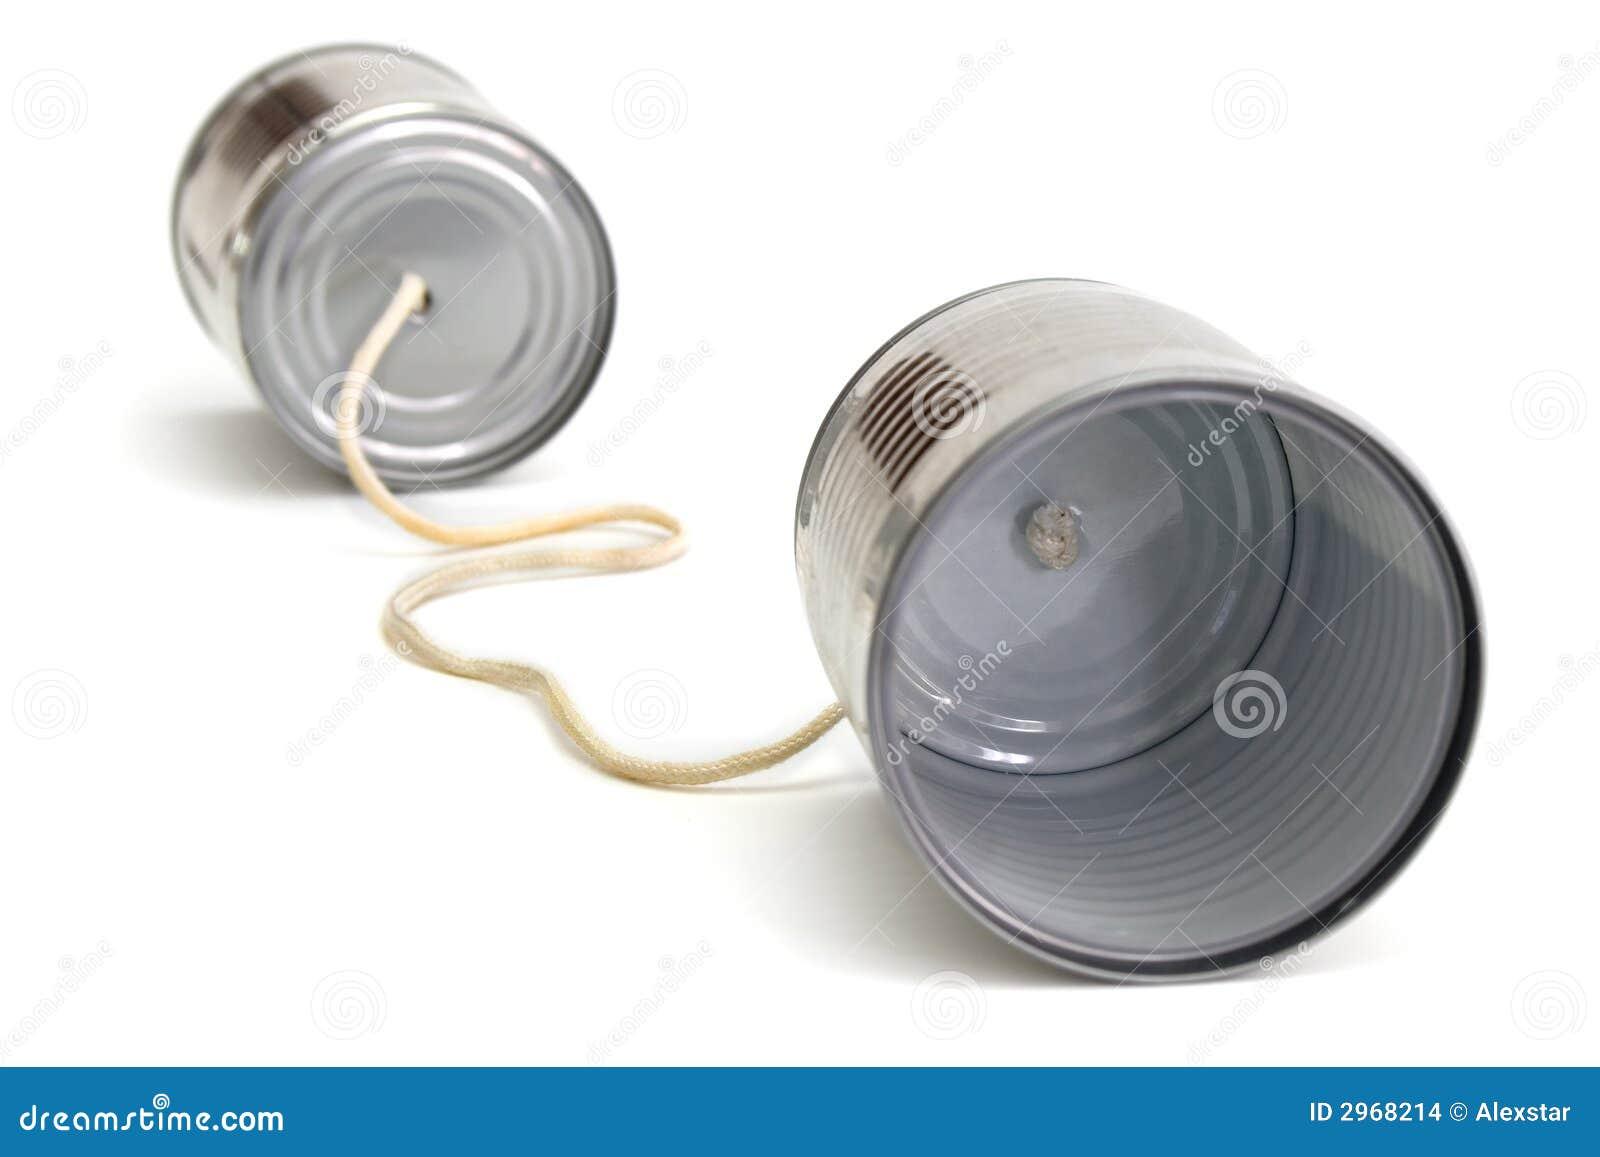 dosentelefon-der-kinder-2968214.jpg